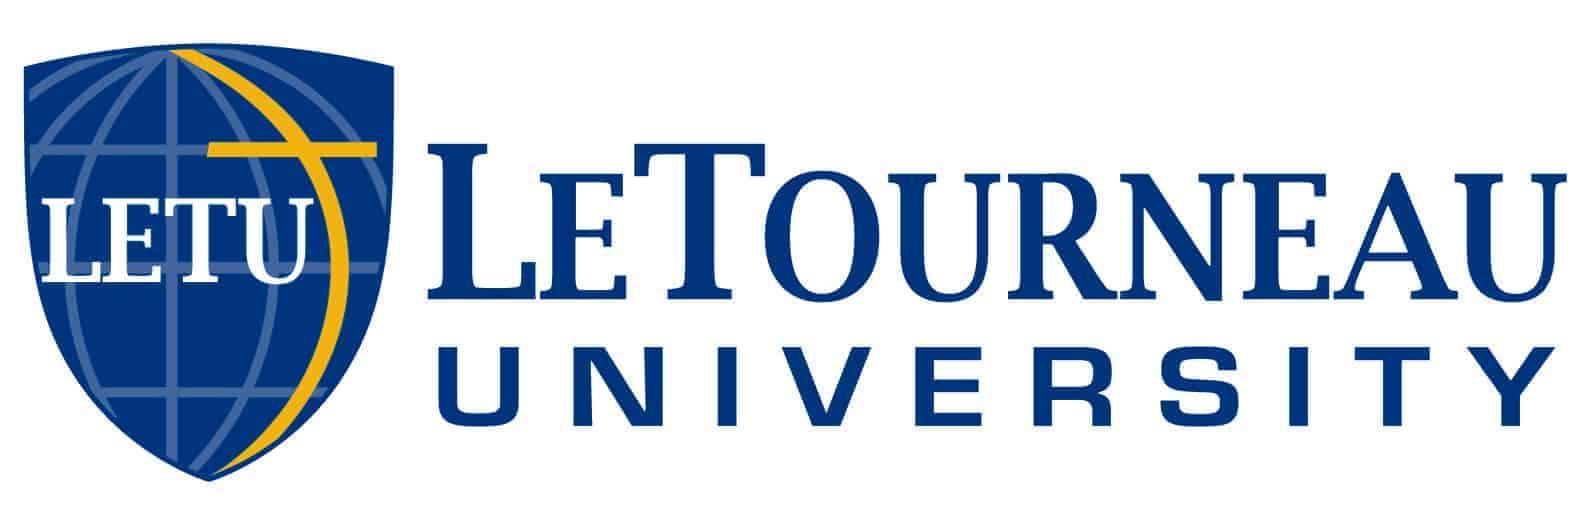 adult education degree programs letourneau university logo 129952